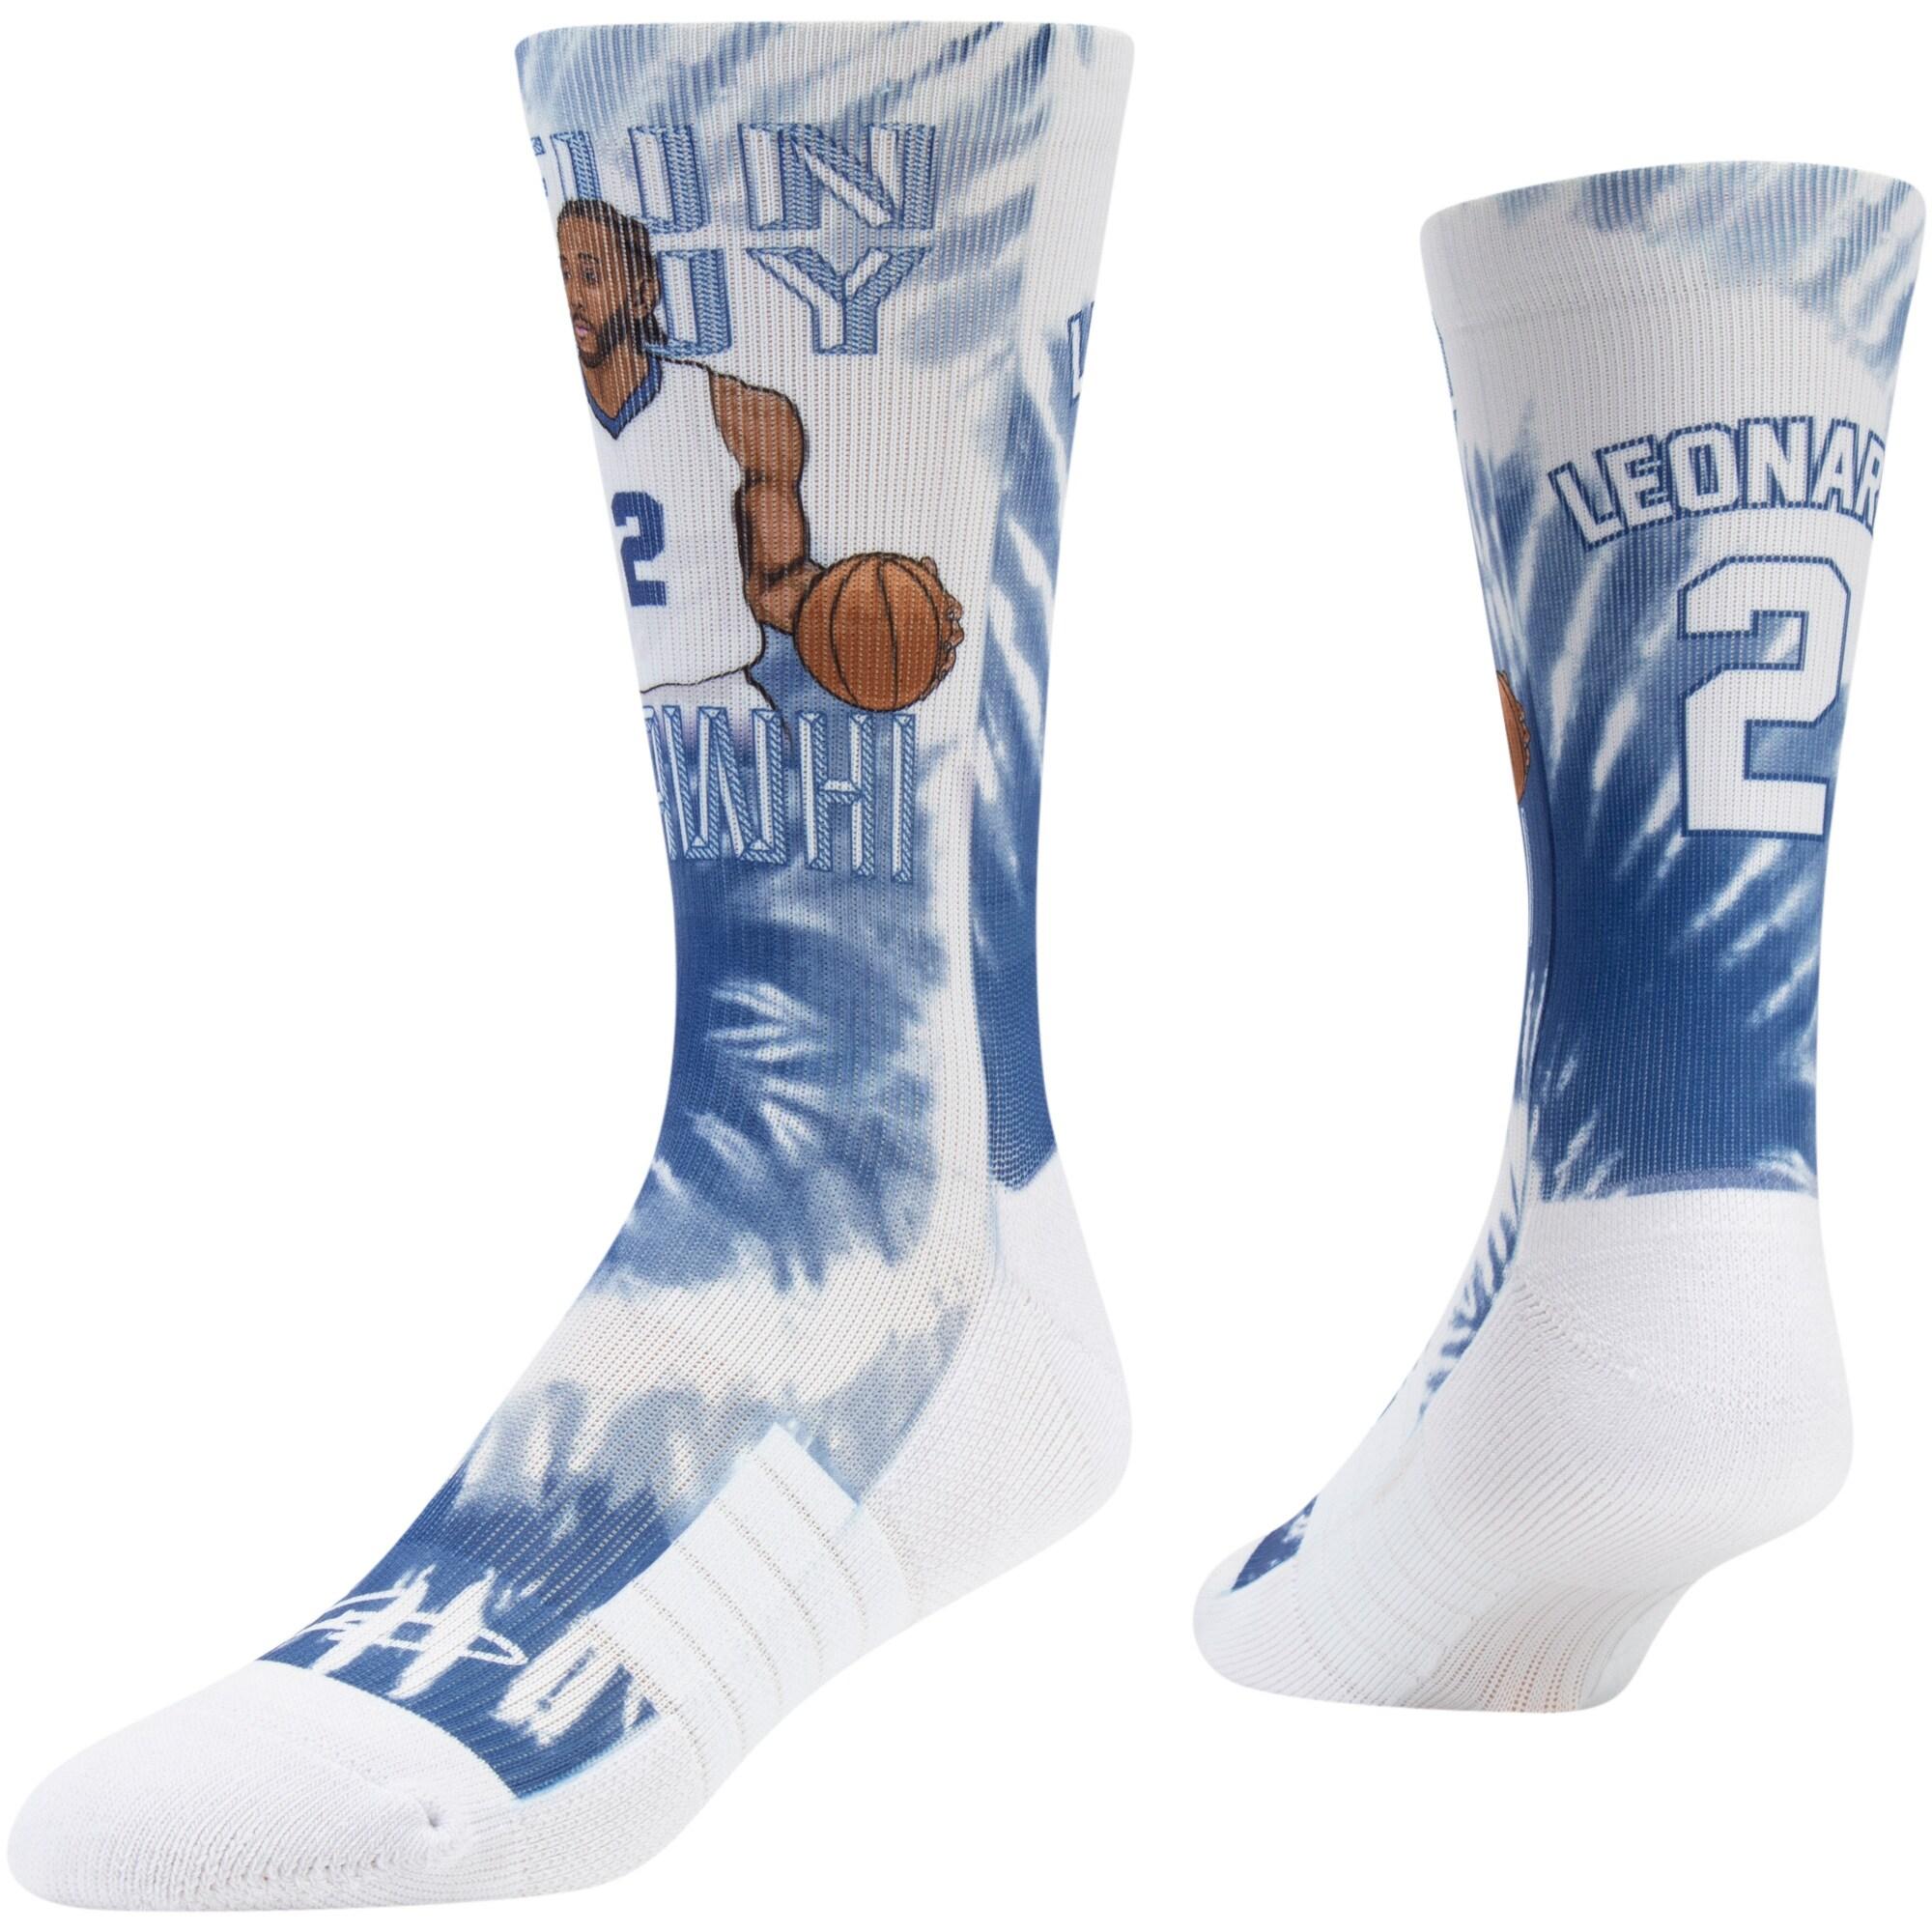 Kawhi Leonard LA Clippers Strideline Premium Comfy Crew Socks - Royal